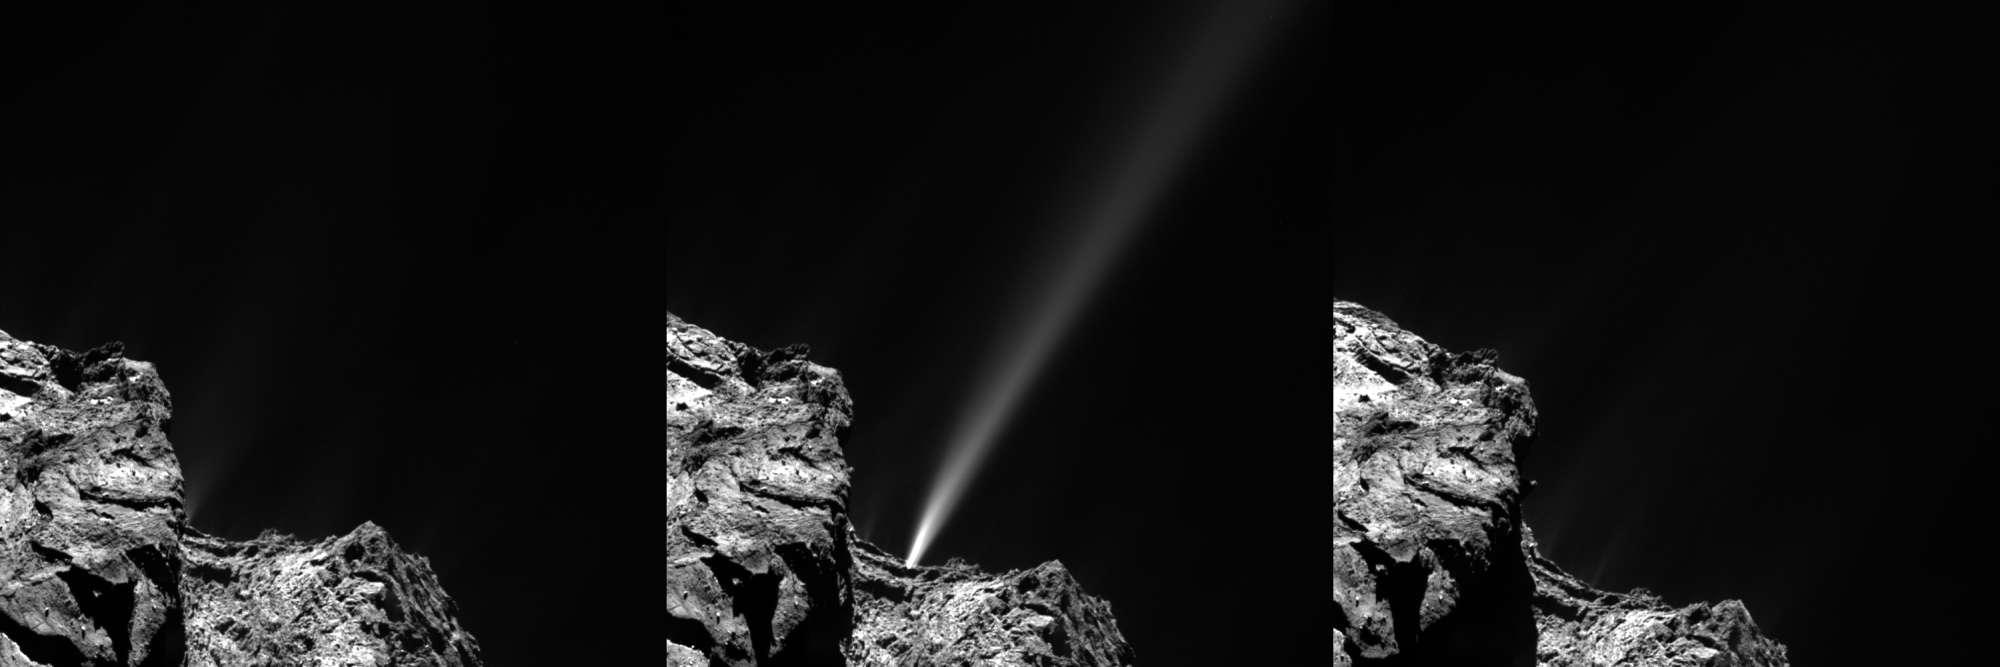 Rosetta detecta un pedo cósmico